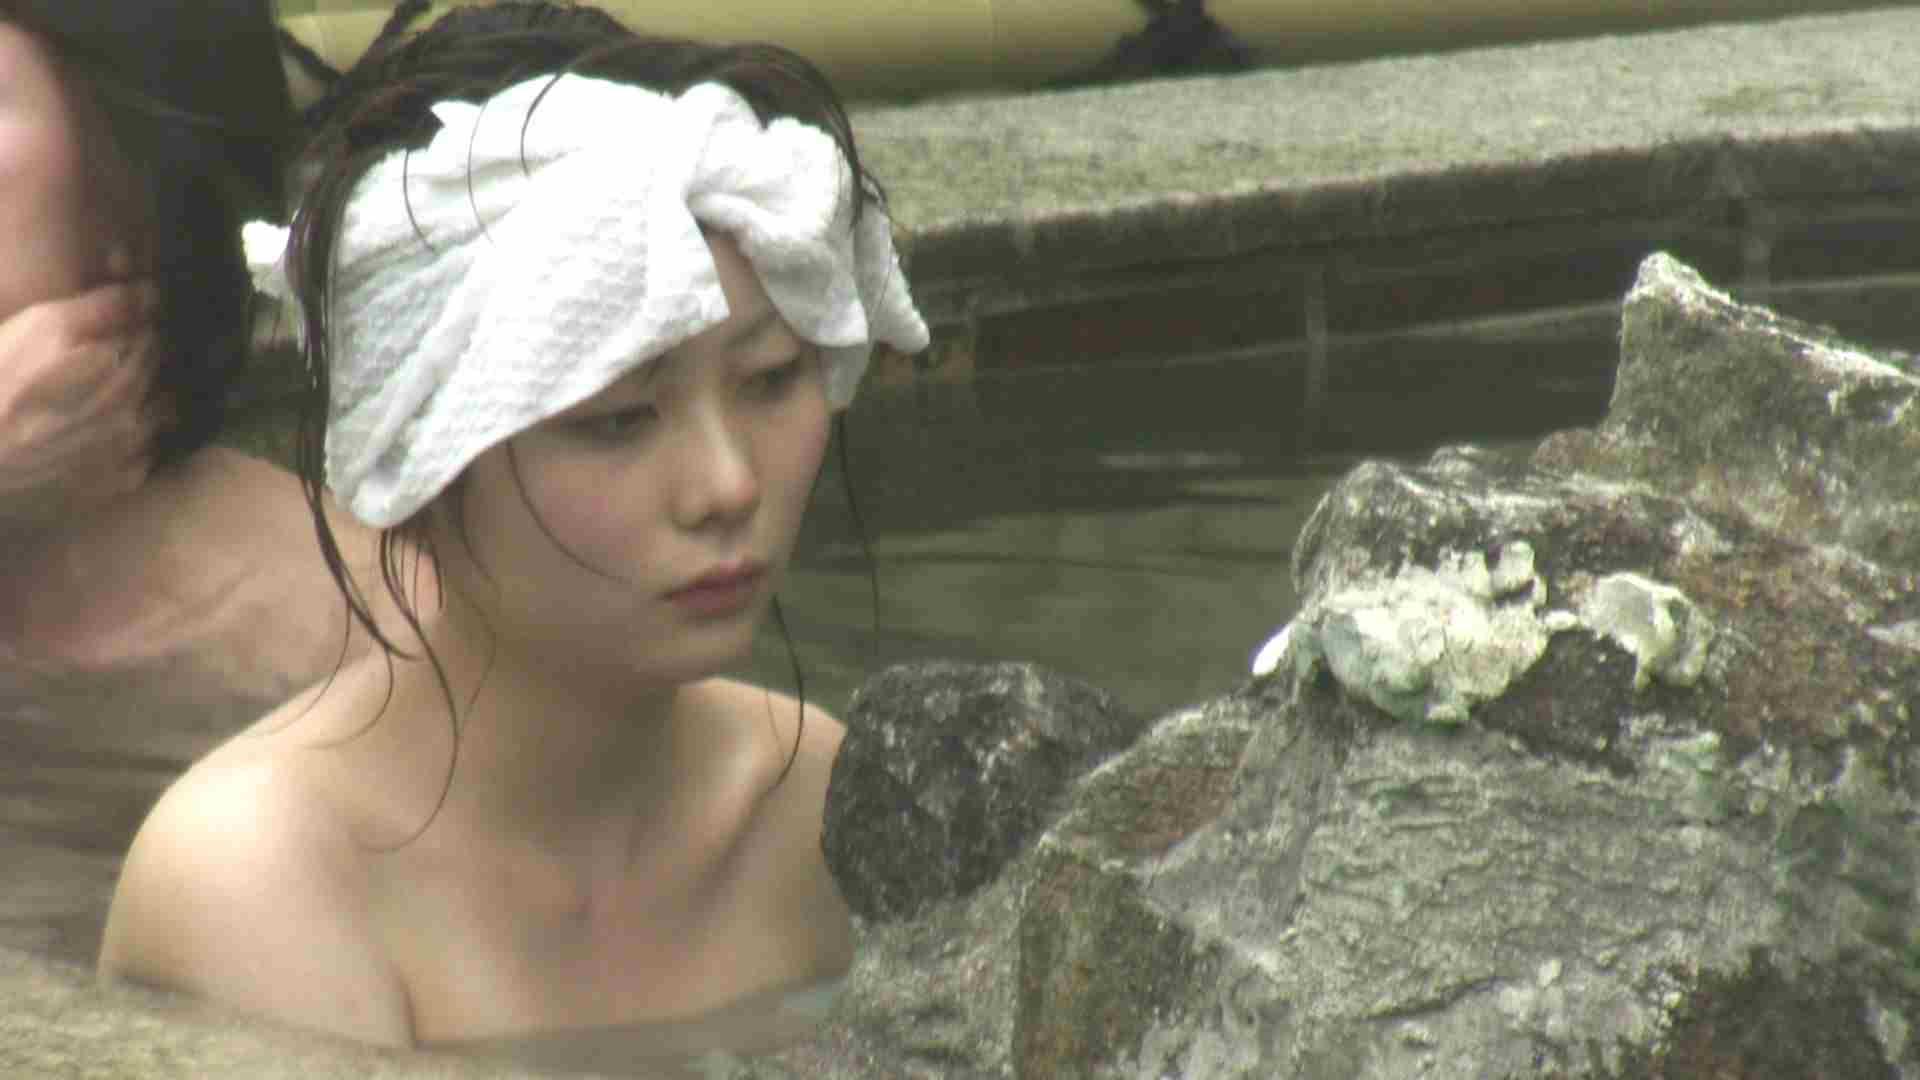 Aquaな露天風呂Vol.147 露天 濡れ場動画紹介 85画像 23